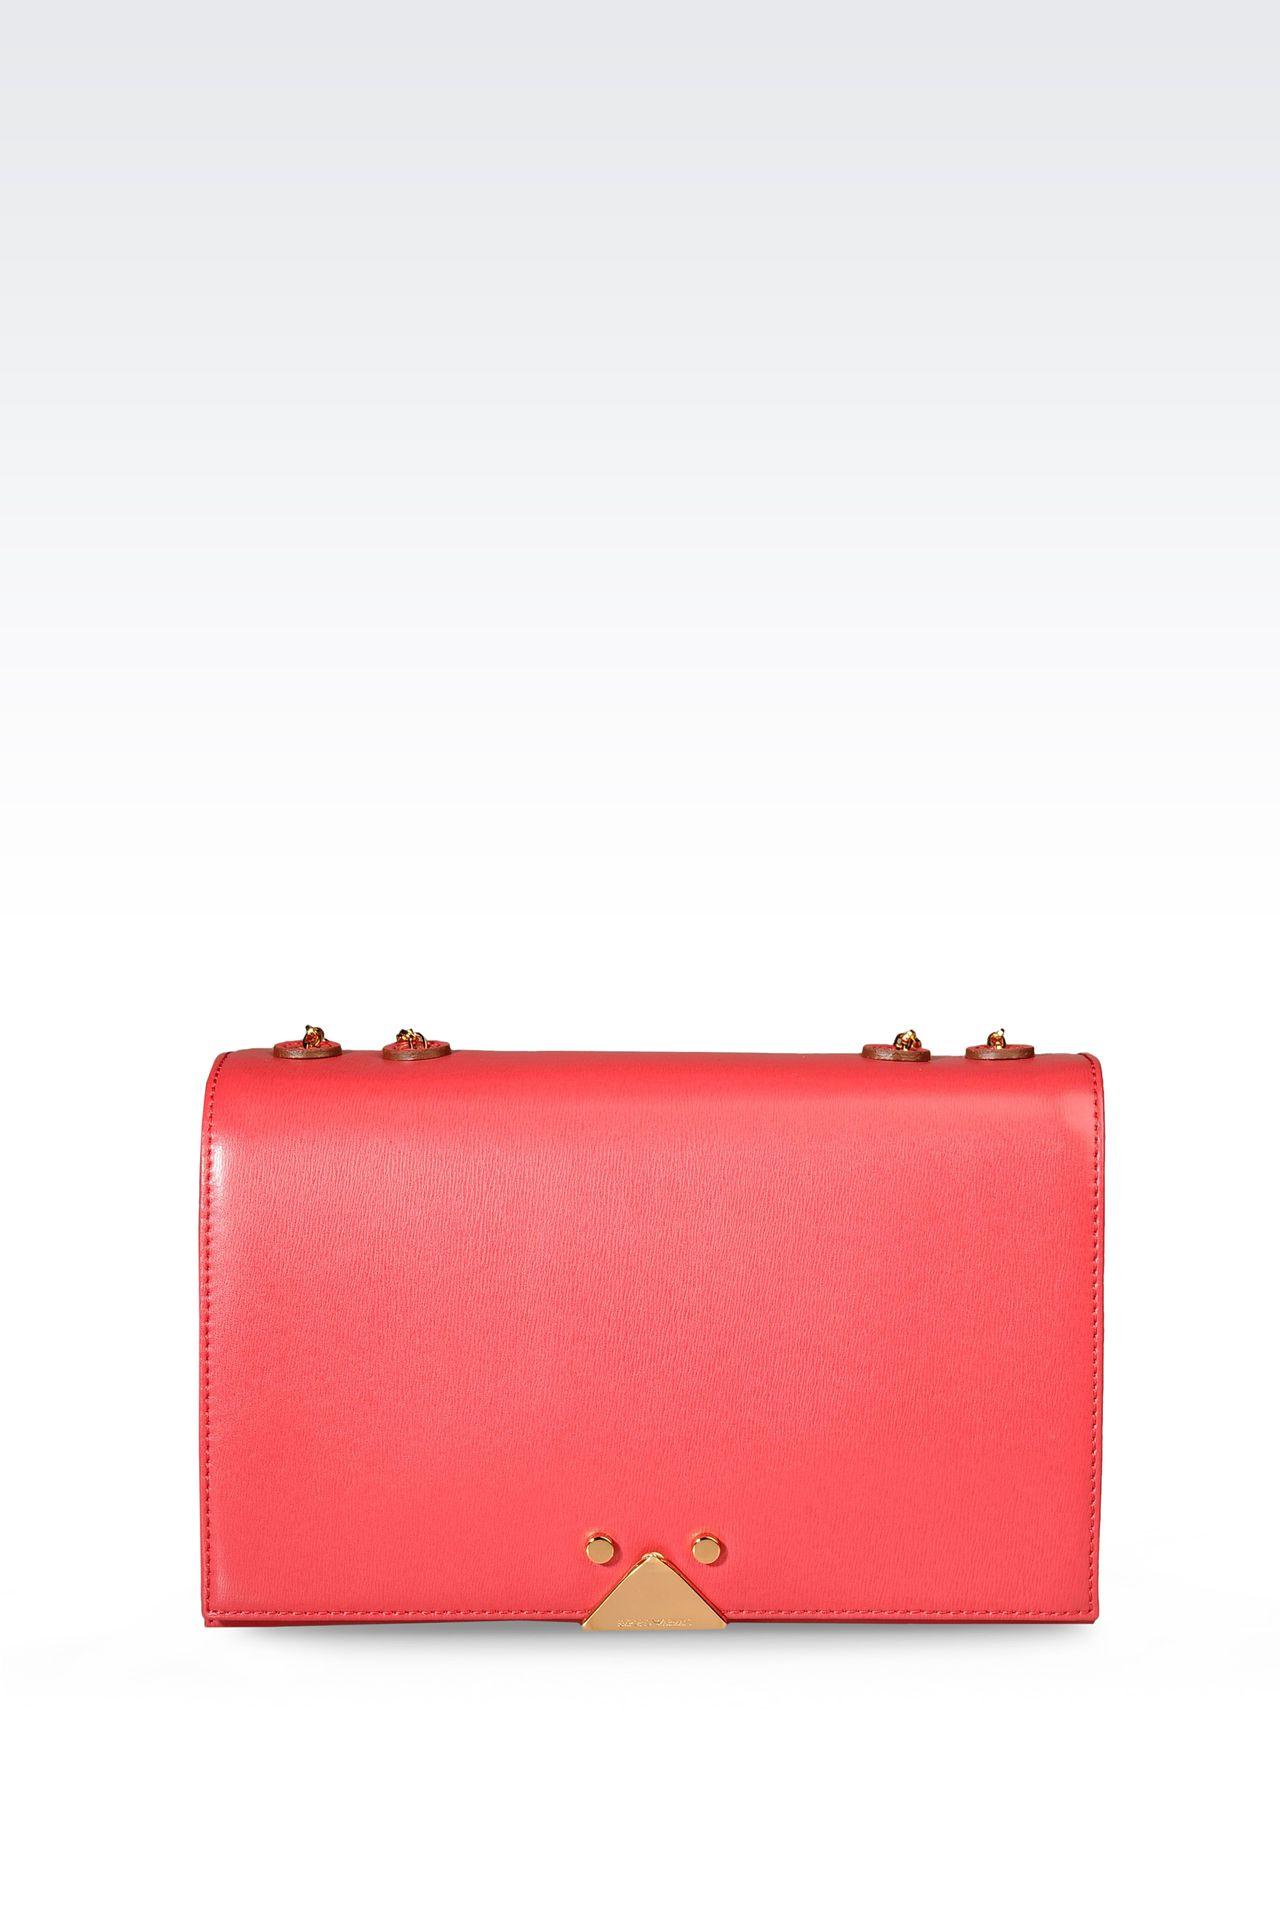 Emporio Armani Women Messenger Bag - Emporio Armani Official Online Store